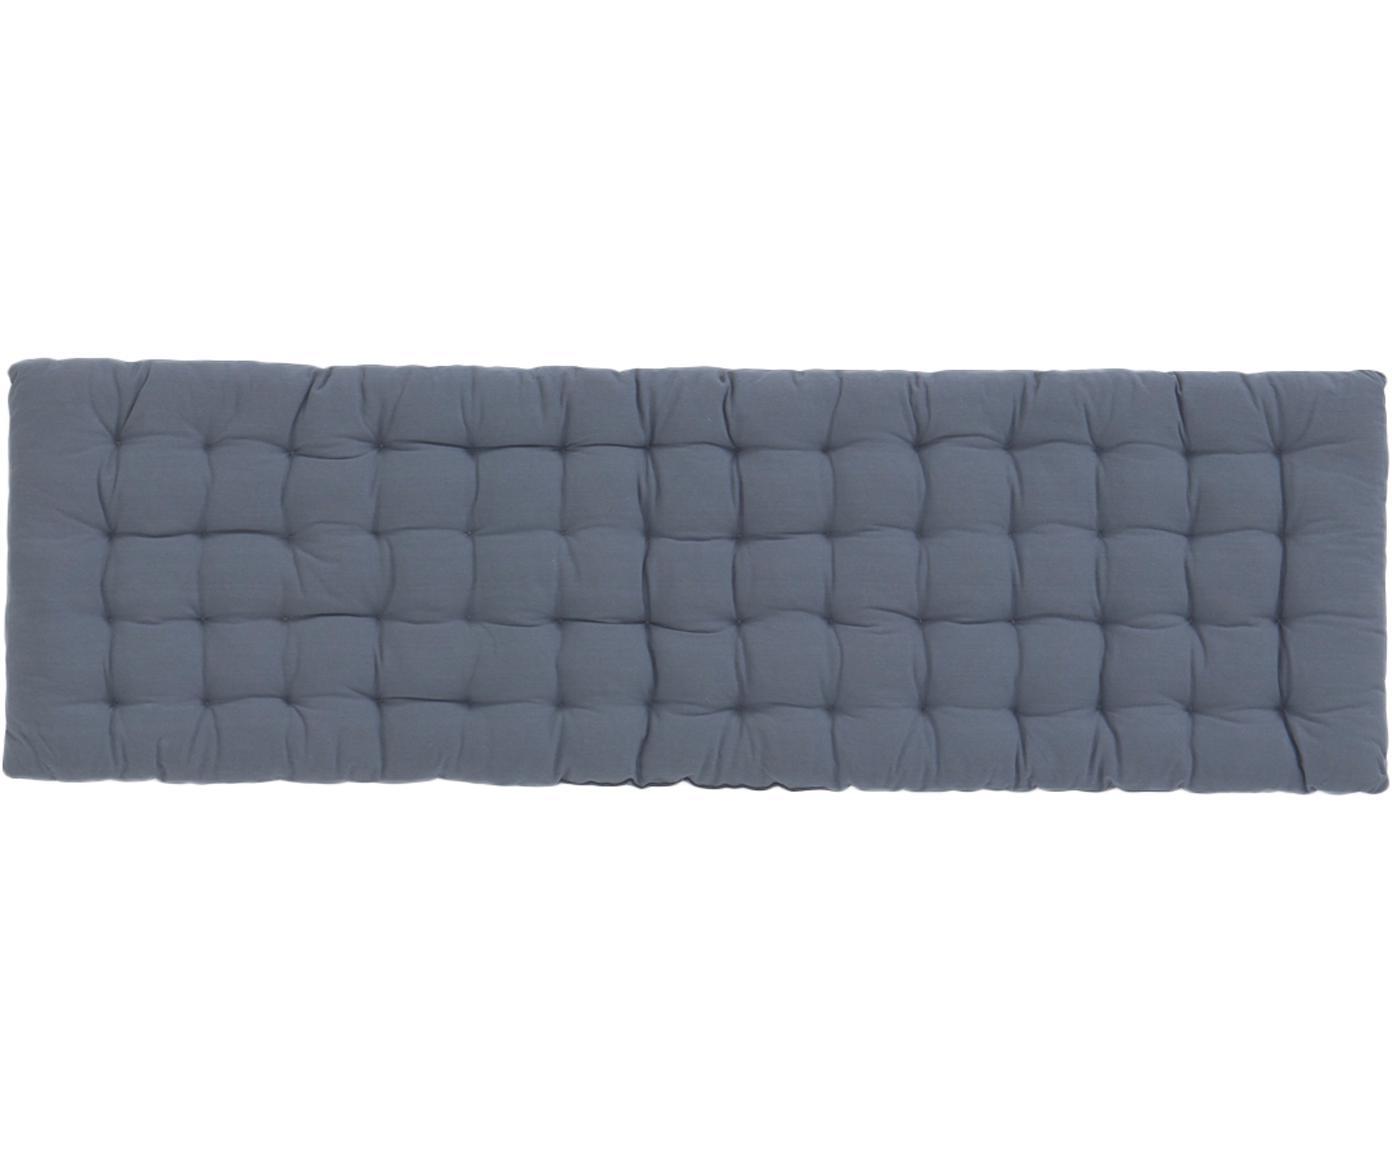 Stoelkussen Gavema, Blauw, 40 x 120 cm